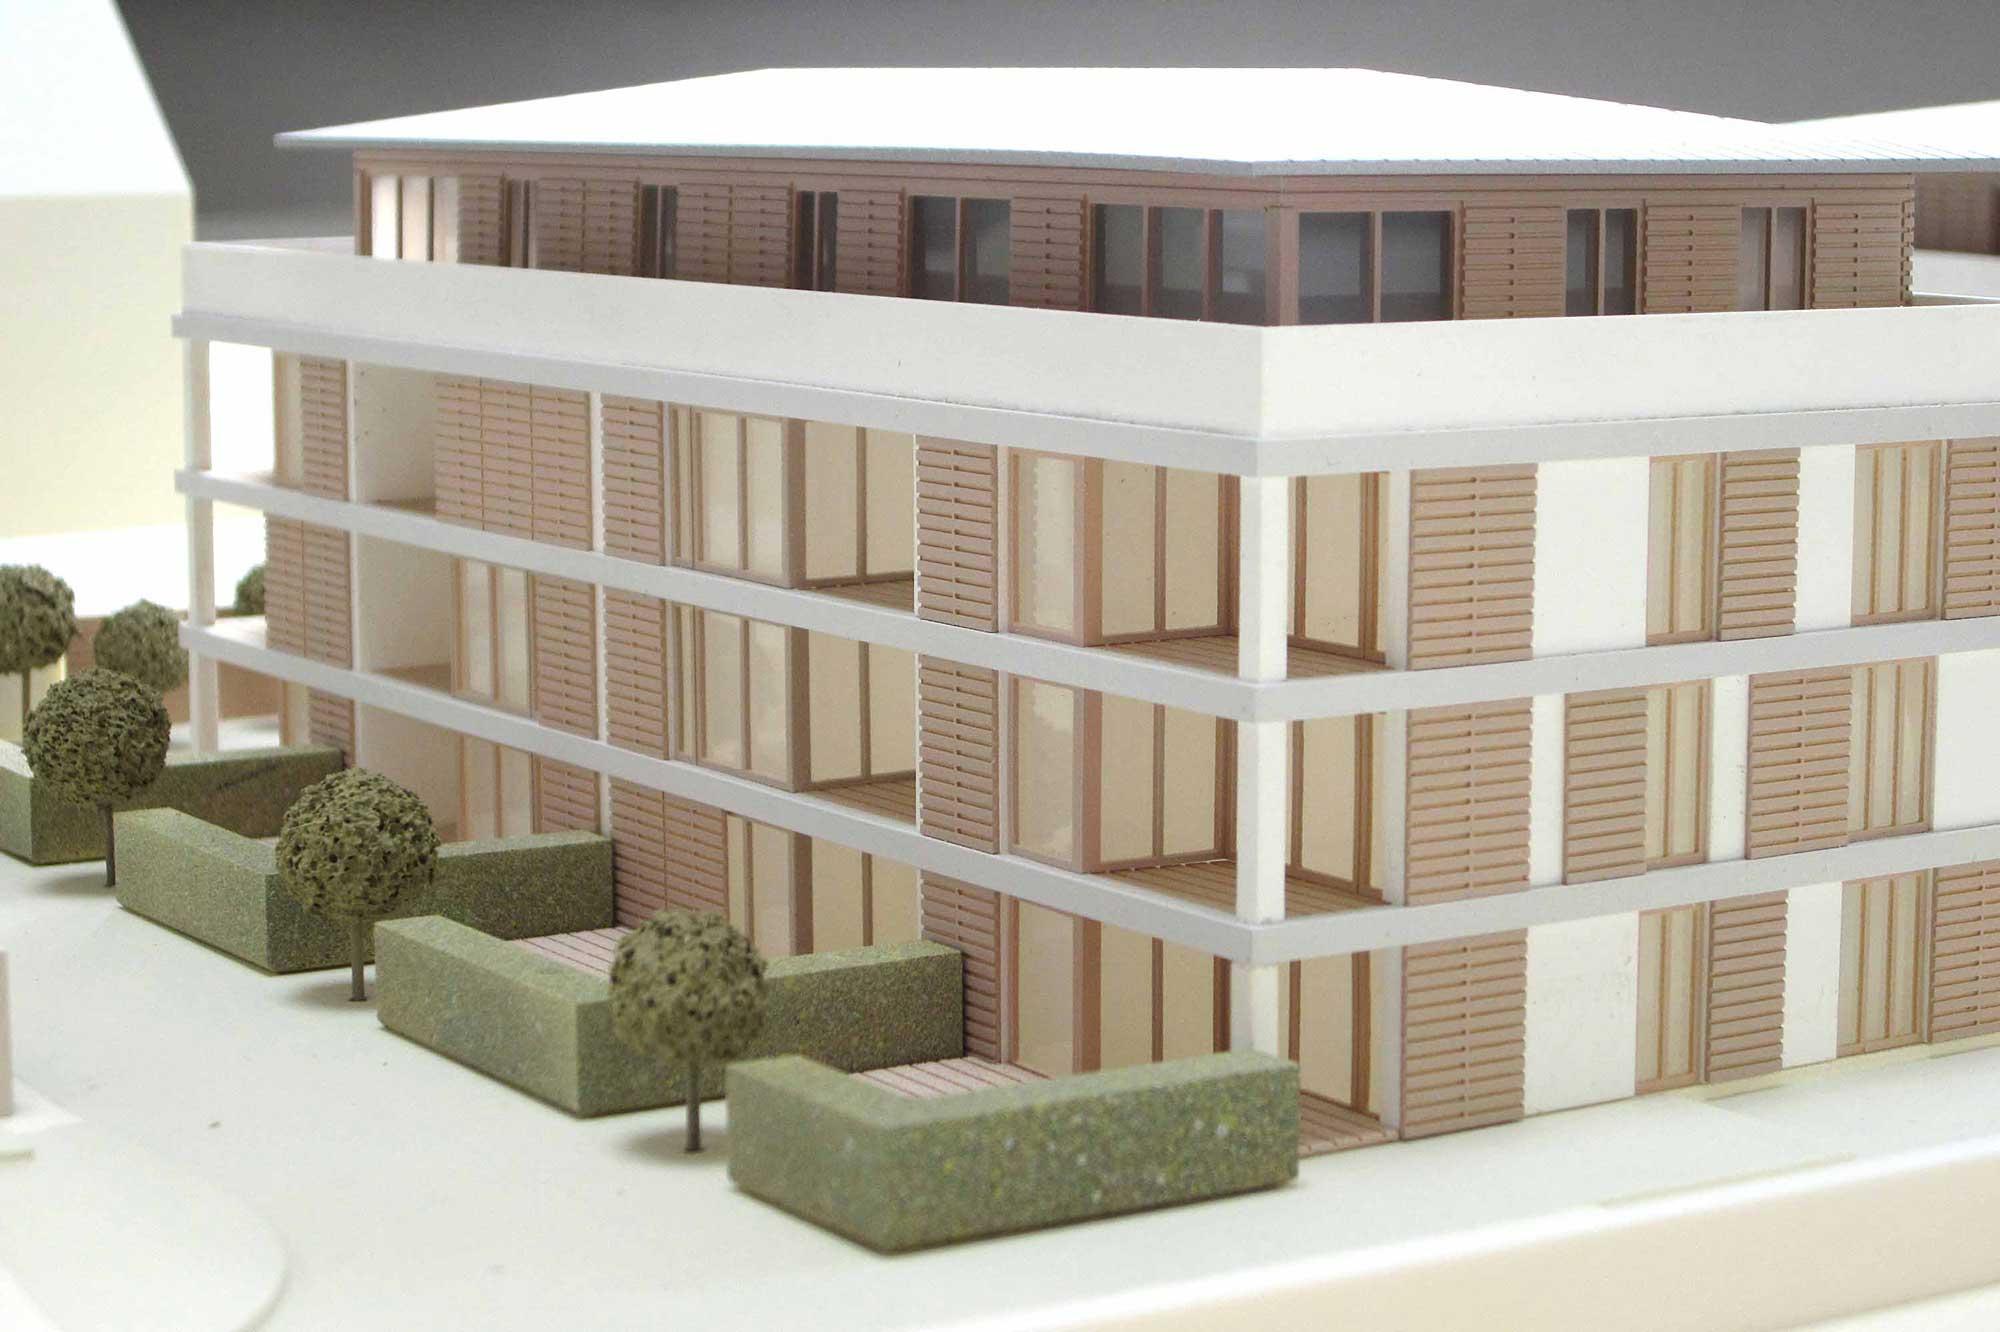 Präsentationsmodell Immobilienprojekt Holzkirchen, einzelobjekt